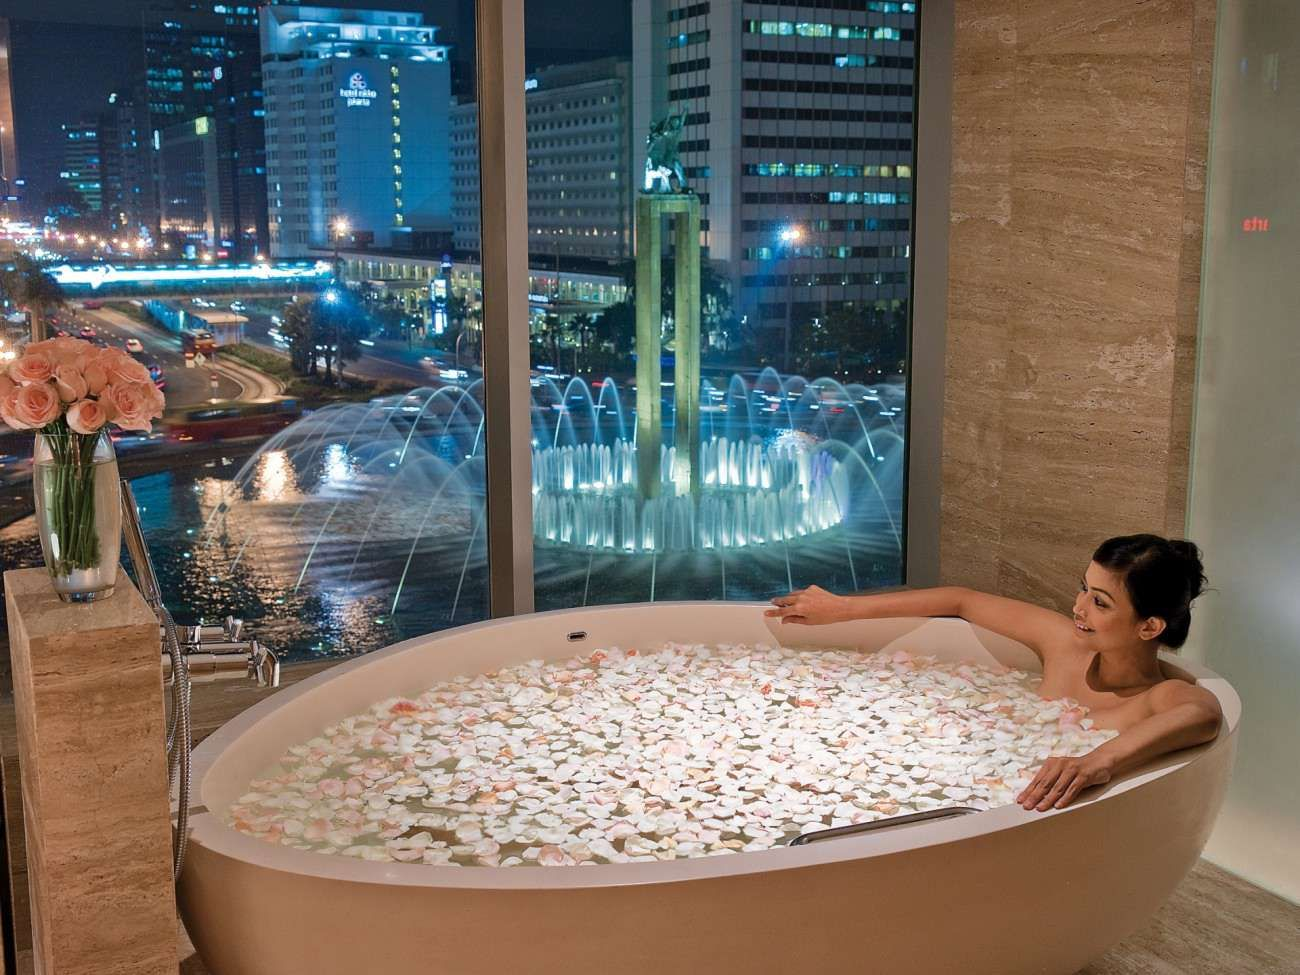 Http Www Kempinski Com Assets Hotel Indonesia Kempinski Jakarta Roomssuites Resampled Setwidth1300 Jkt1bathroomlb2t Jpg Amazing Bathrooms Tub Bathtub Design